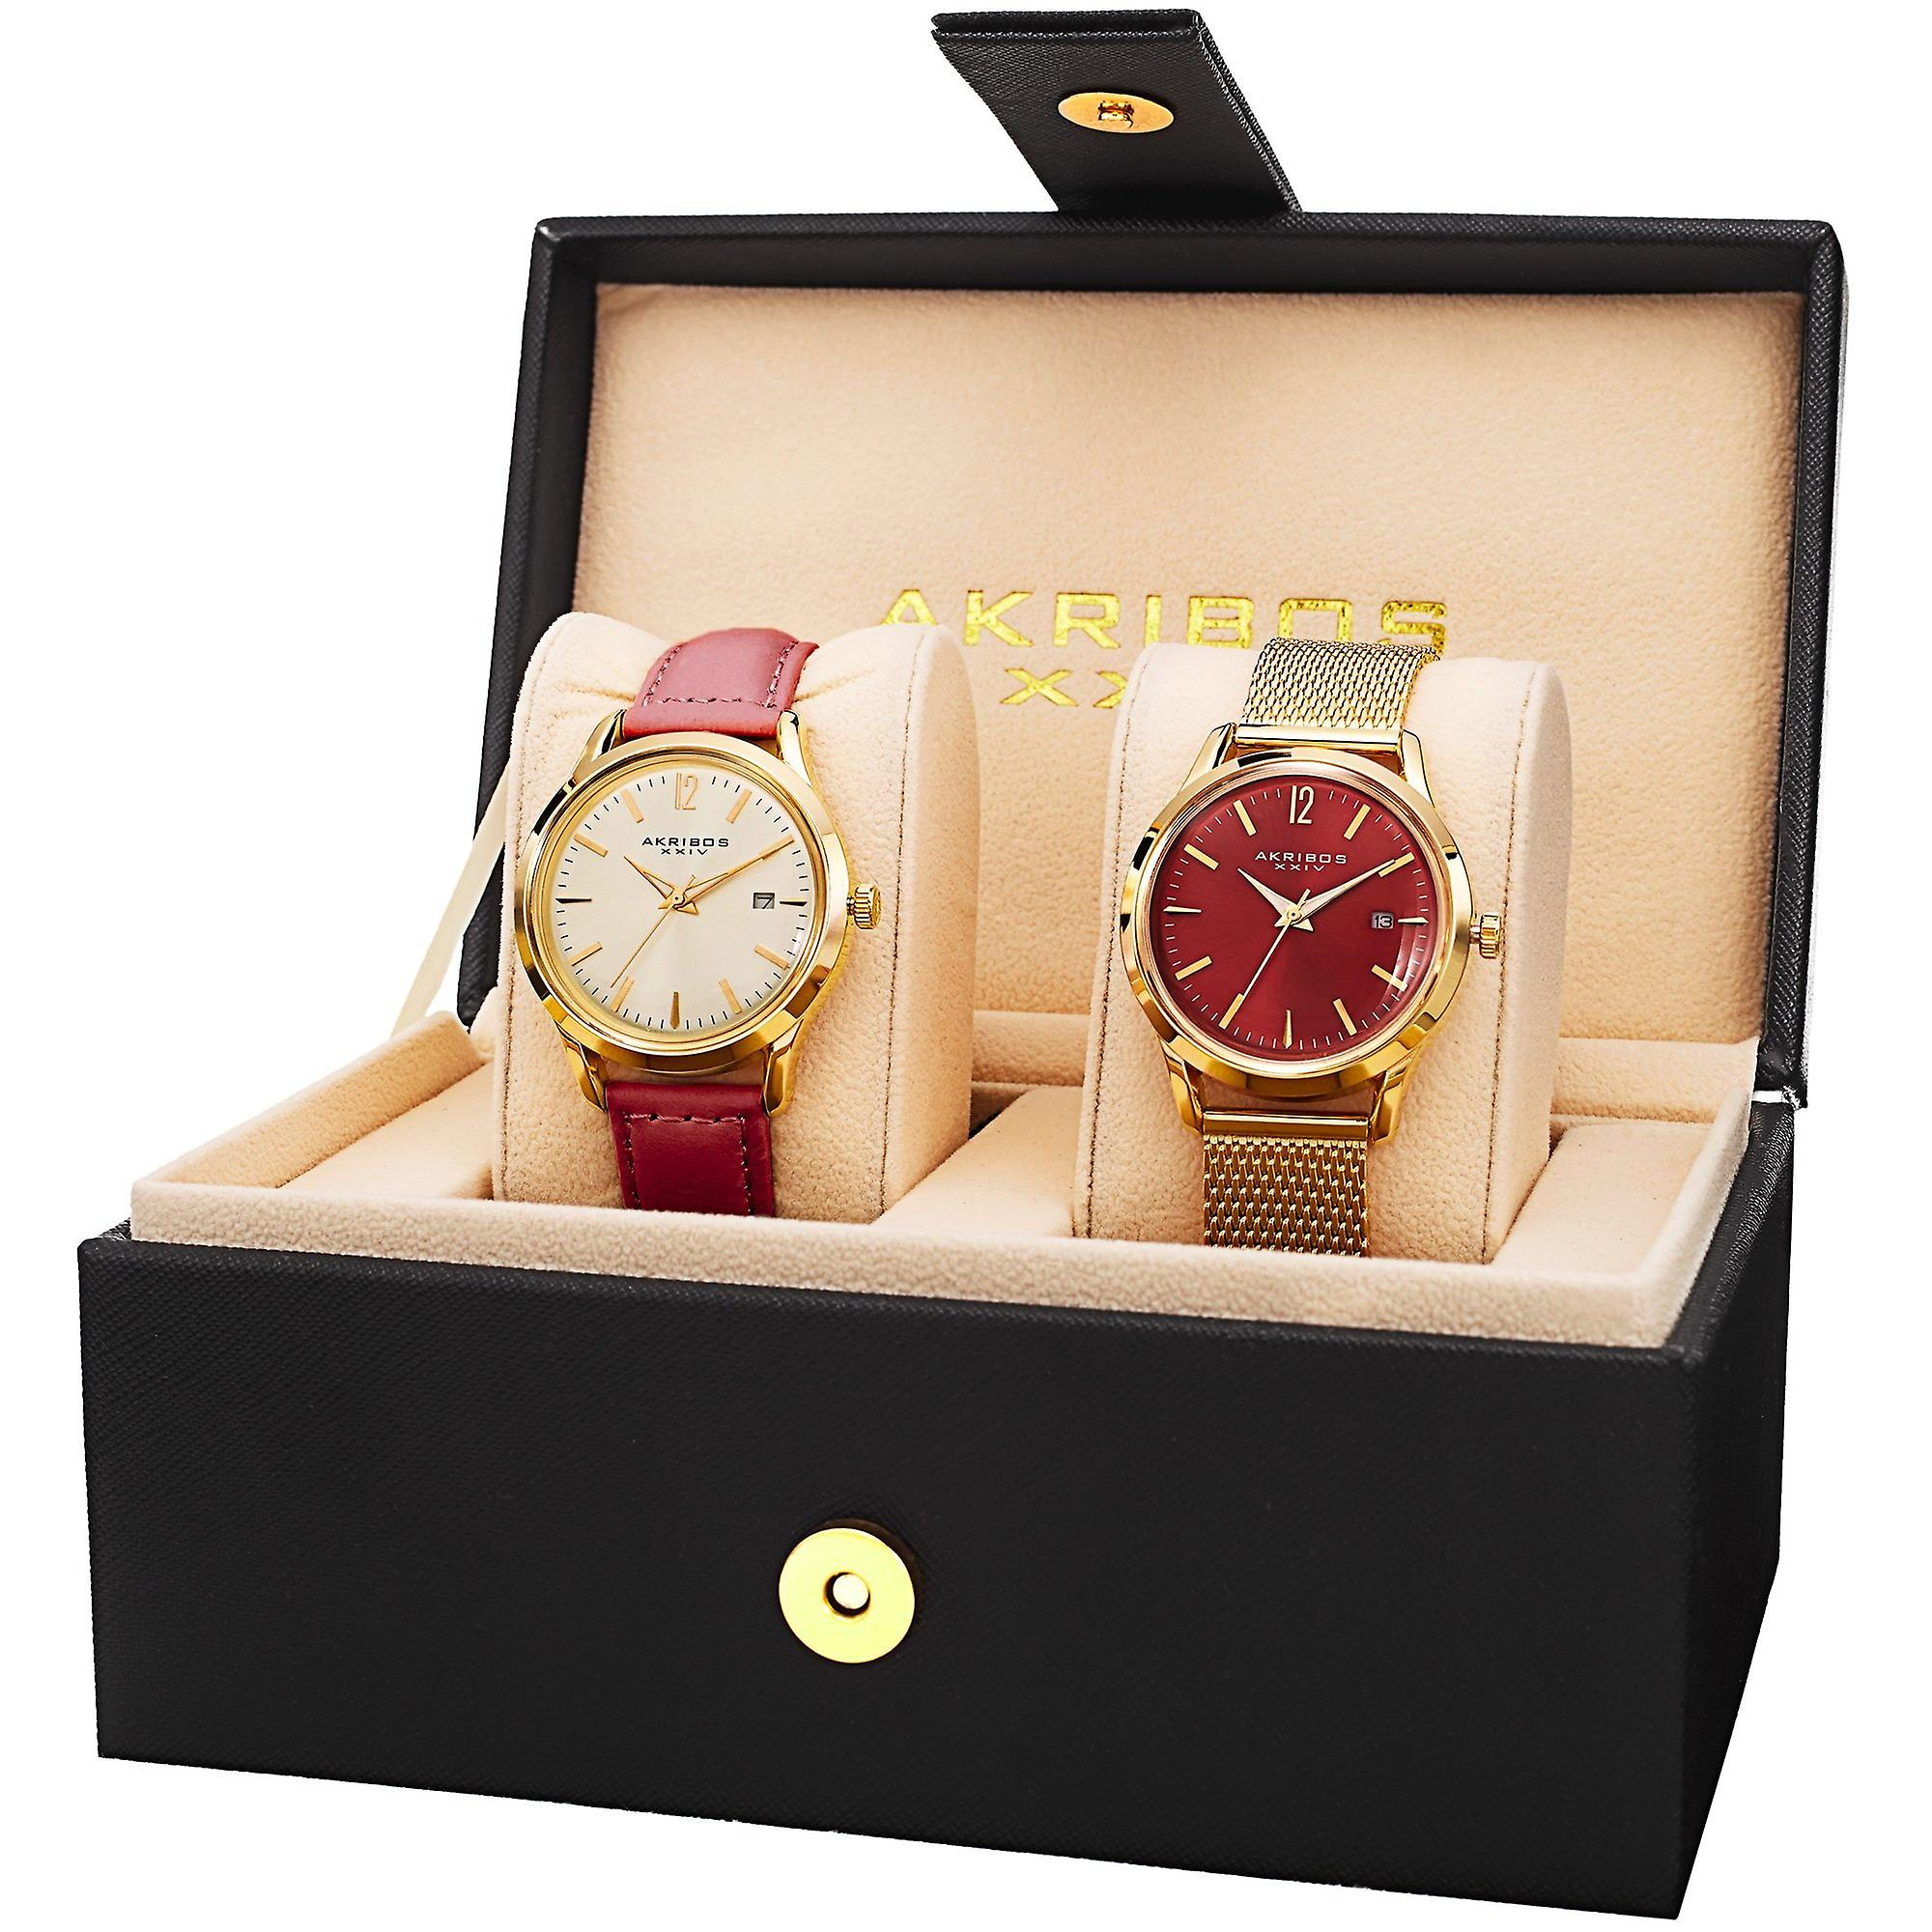 Akribos XXIV AK973RD-S femmesâ ™s Leather Strap Stainless Steel Bracelet Watch Set